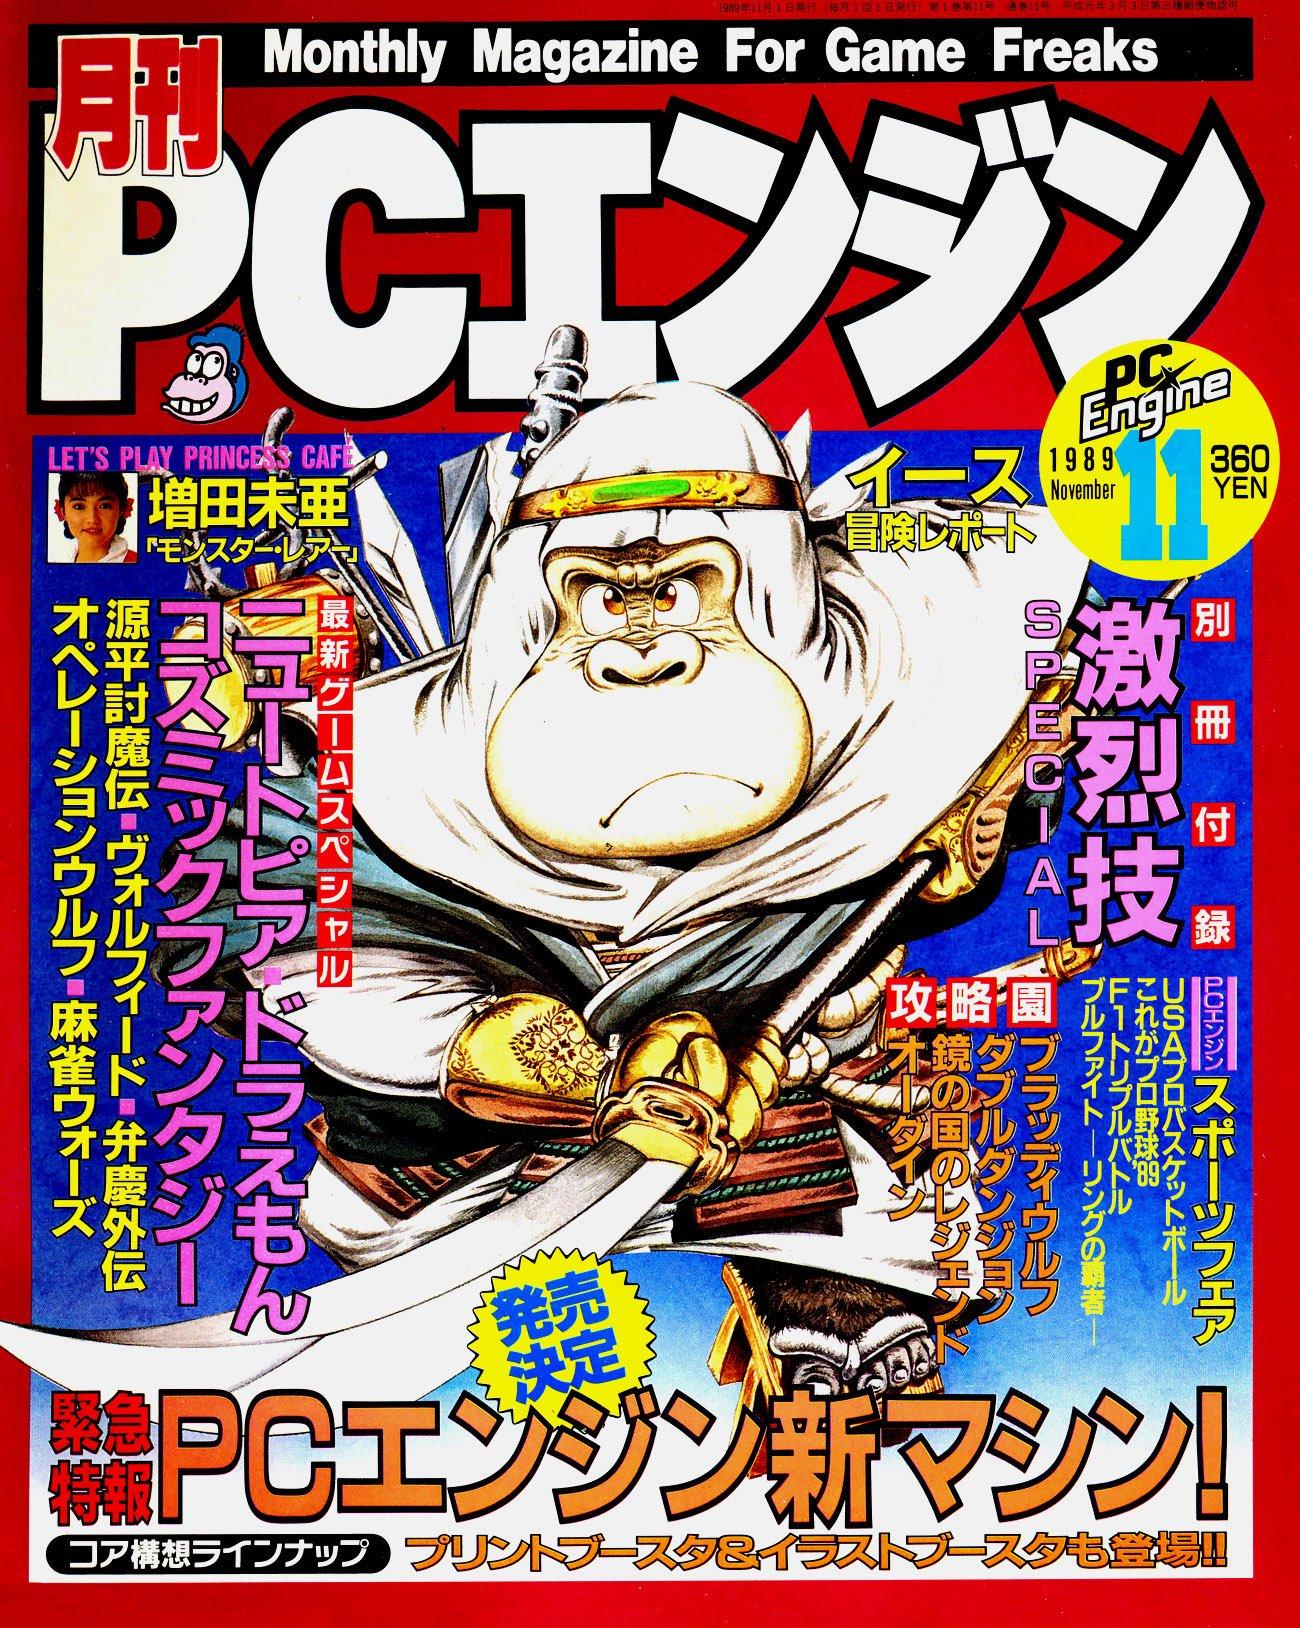 Gekkan PC Engine Issue 11 (November 1989)